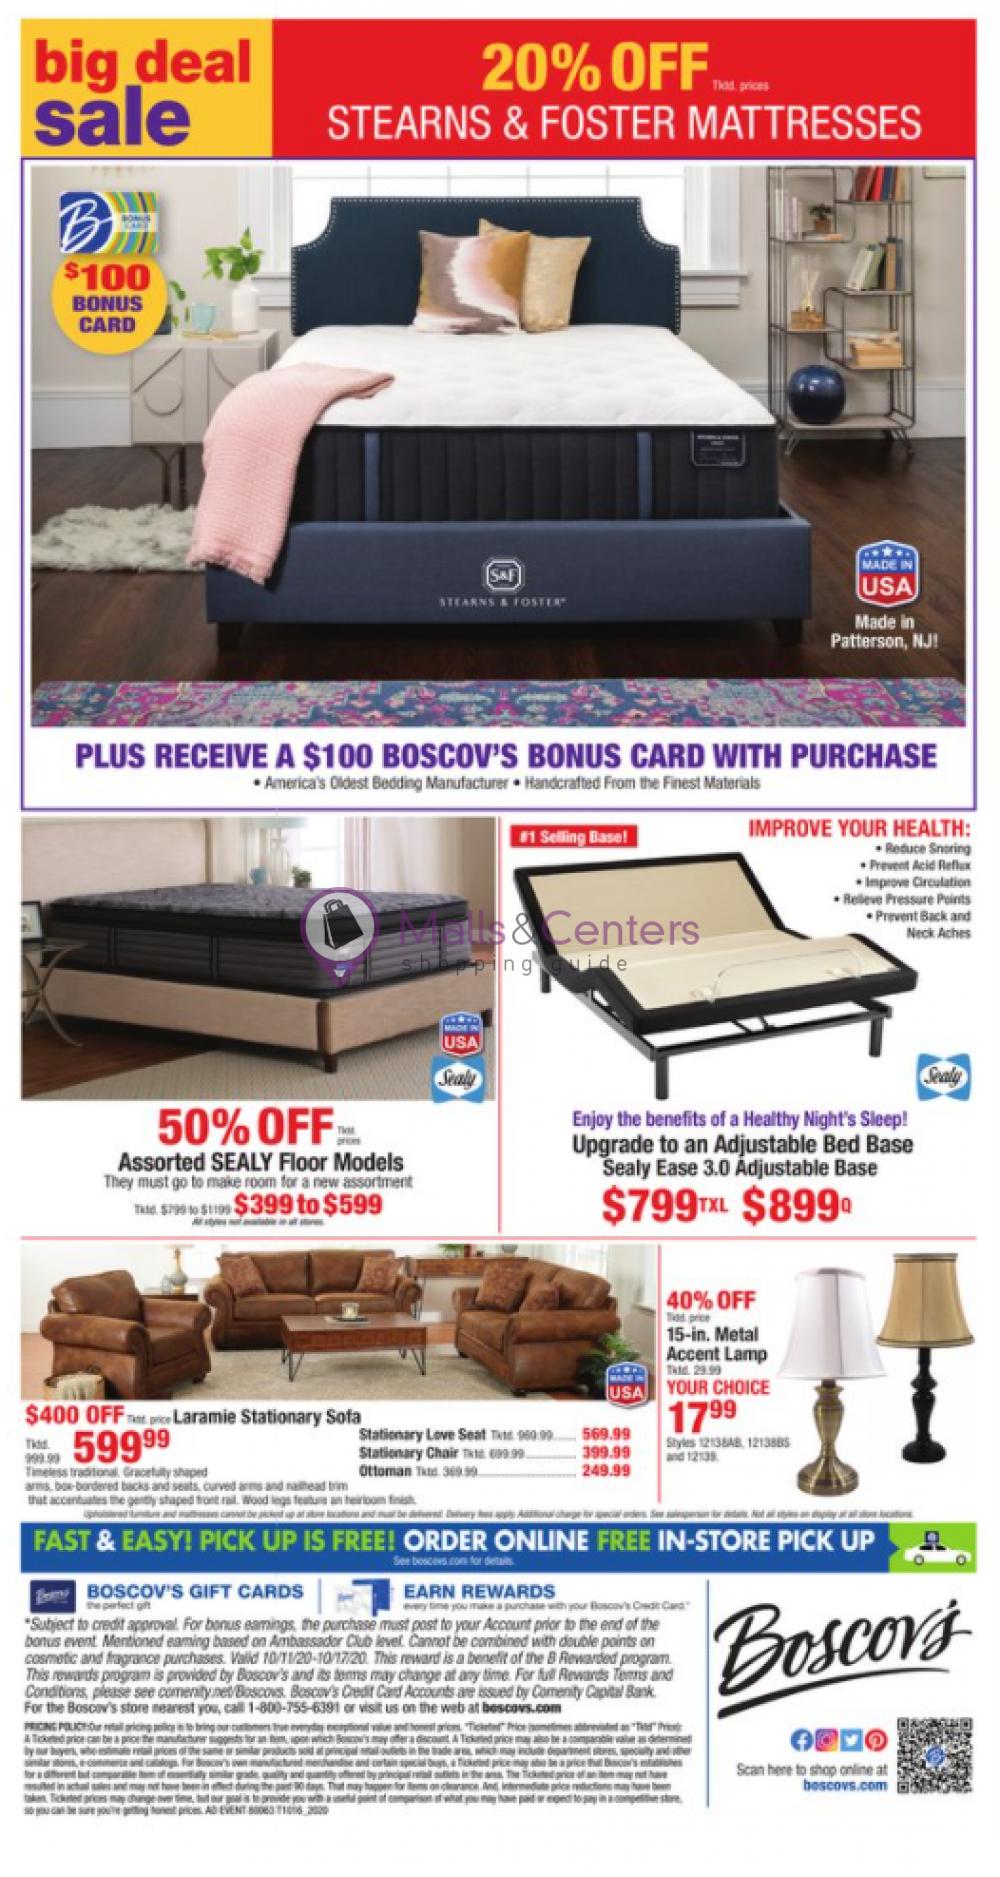 weekly ads Boscov's - page 1 - mallscenters.com